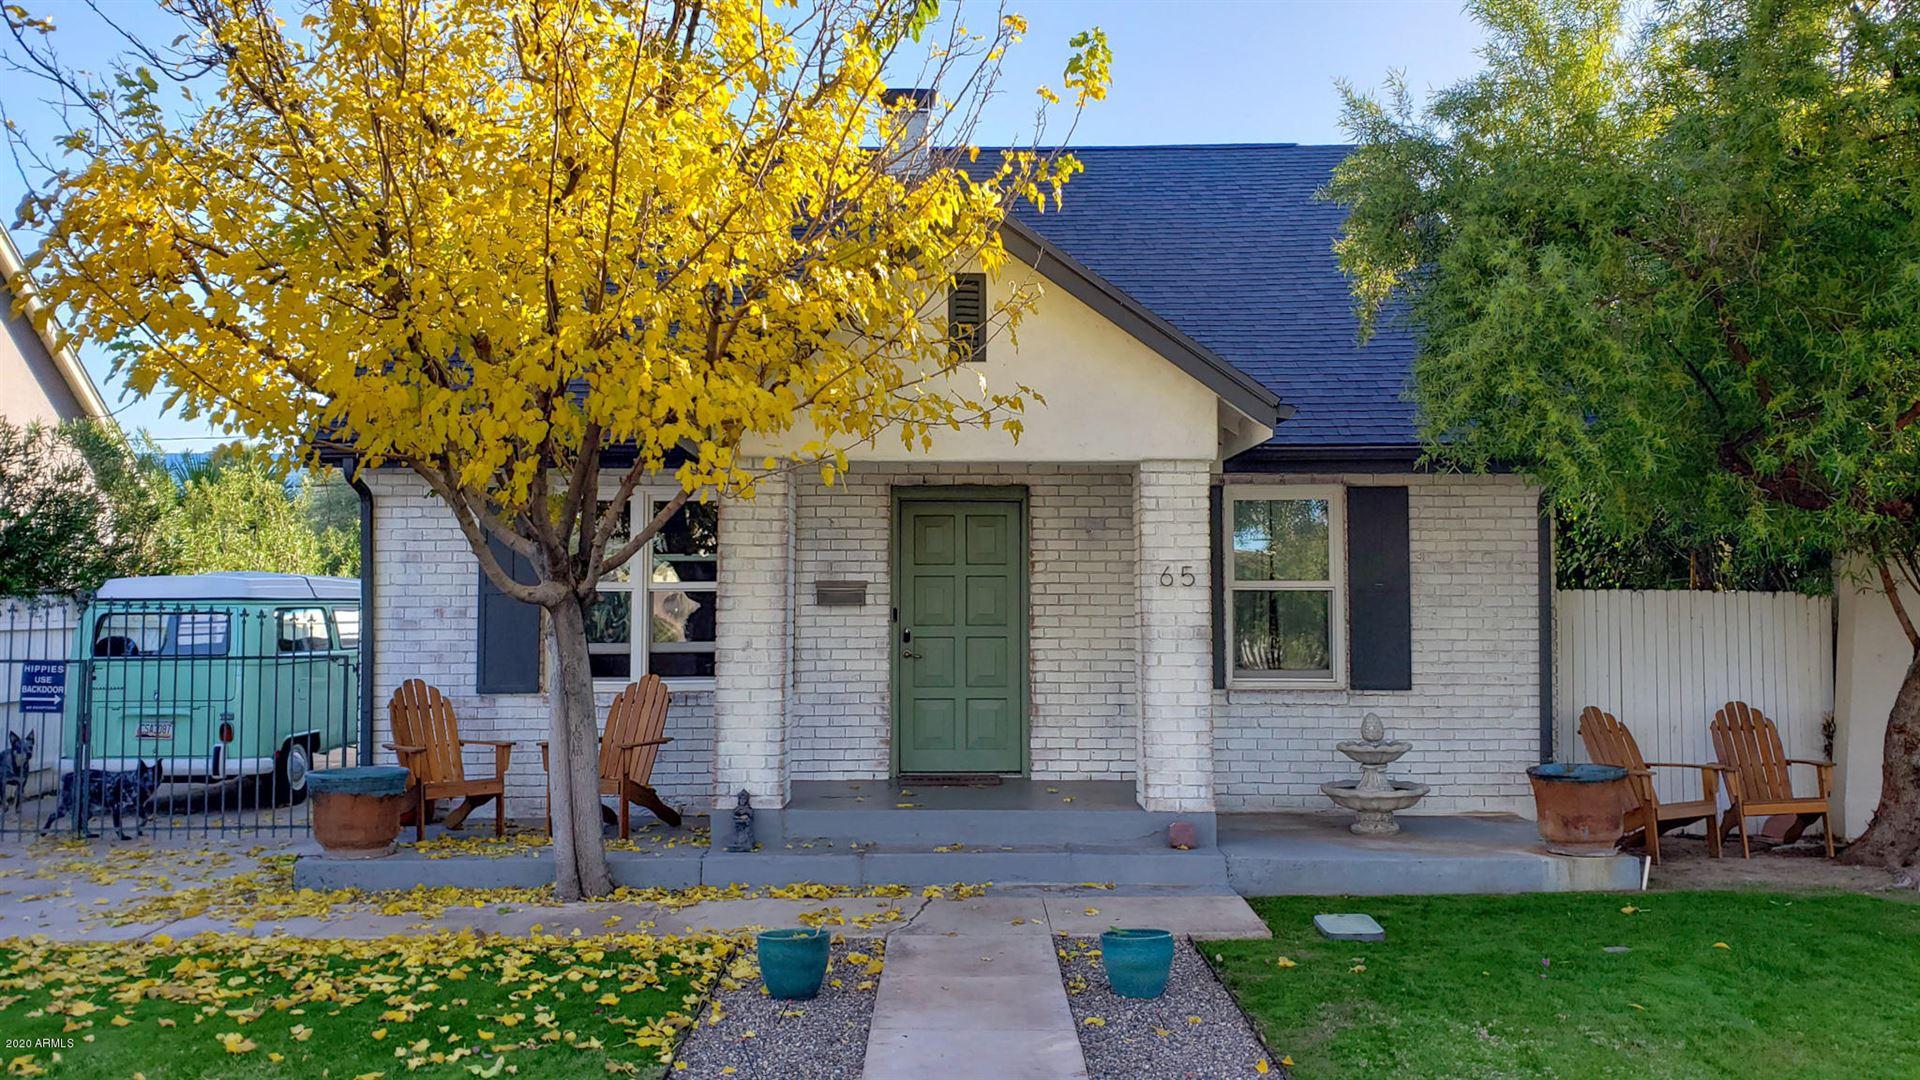 Property Image Of 65 W Lewis Avenue In Phoenix, Az